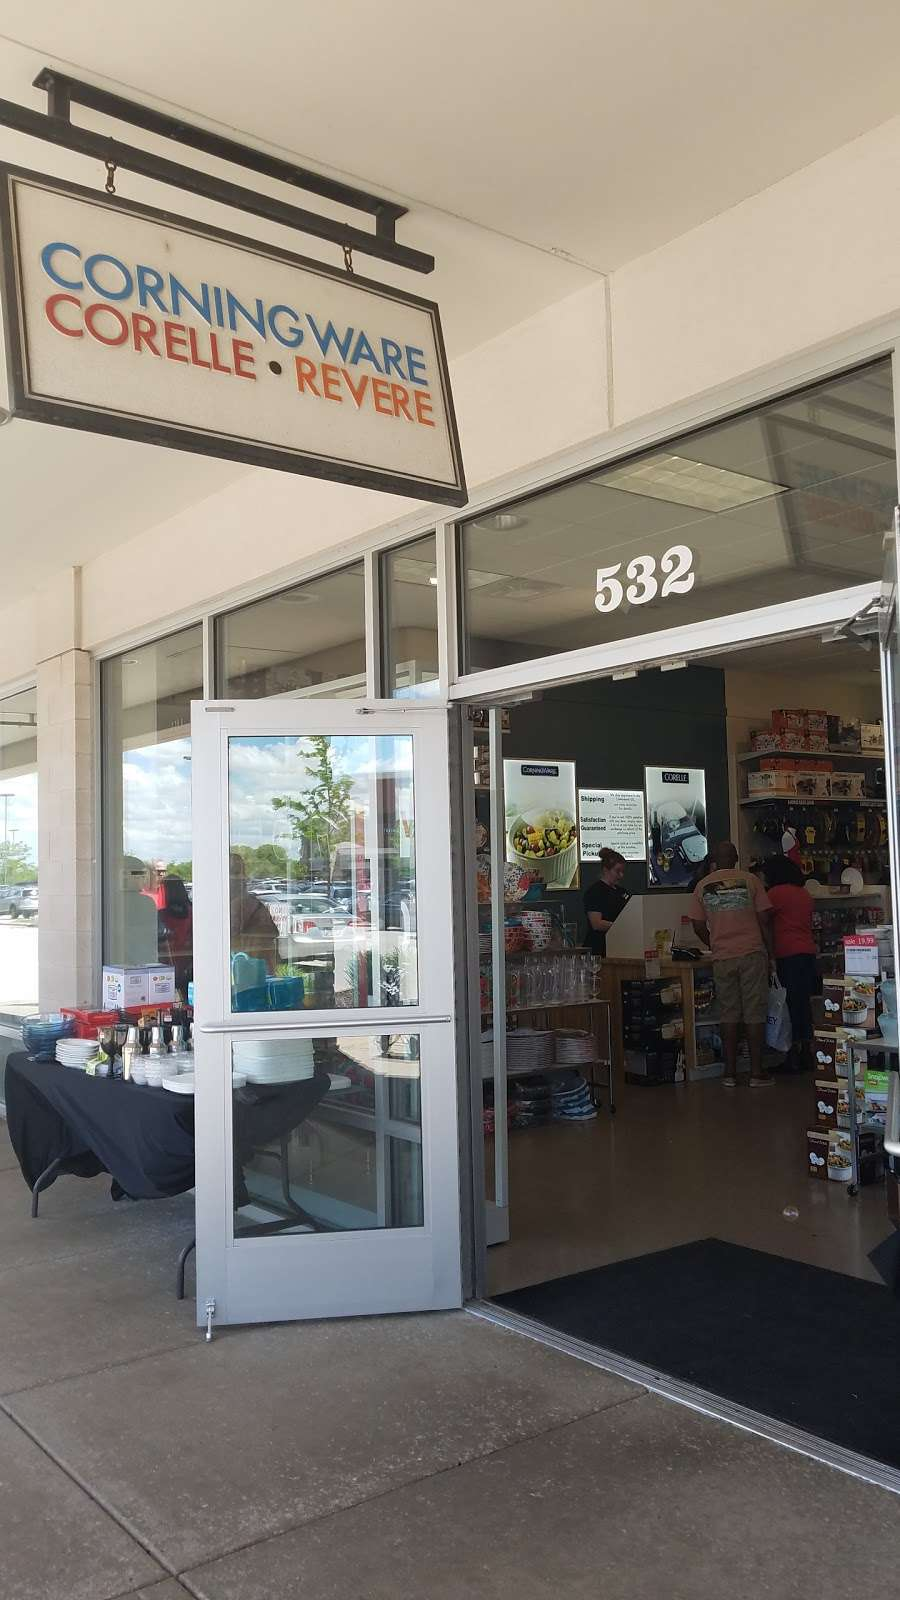 Corningware, Corelle & More - furniture store  | Photo 3 of 5 | Address: 11601 120th Ave #532, Pleasant Prairie, WI 53158, USA | Phone: (262) 857-7949